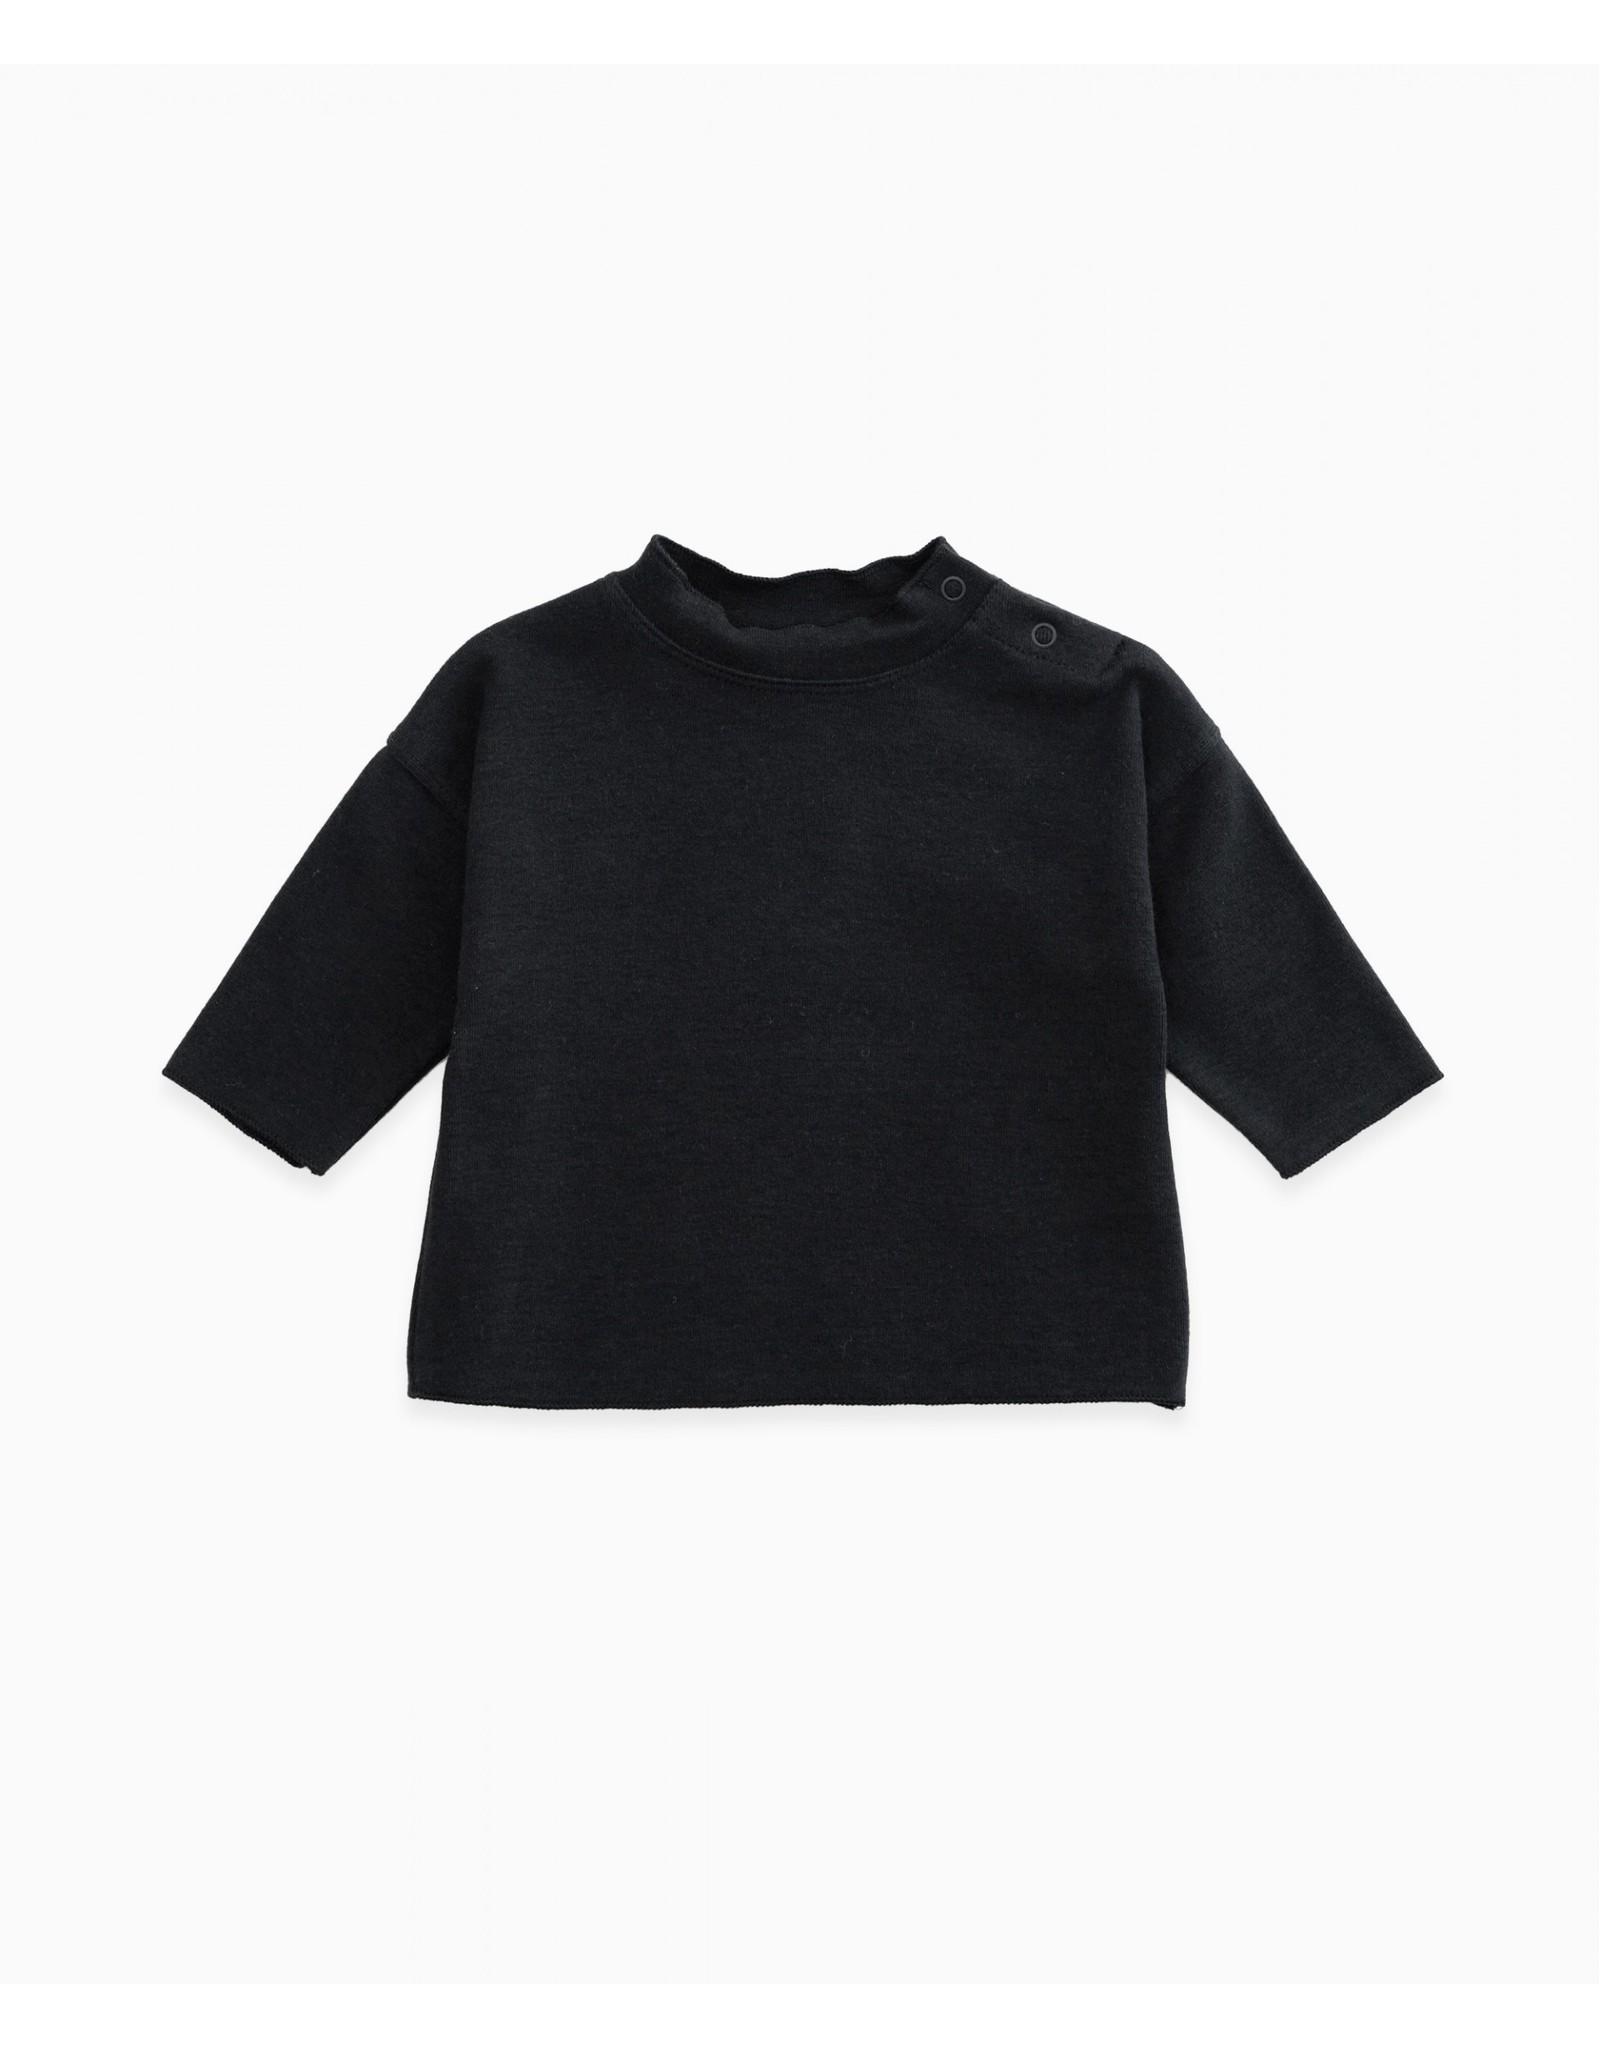 Play Up Play Up ruler (zwart) shirt met knoopjes